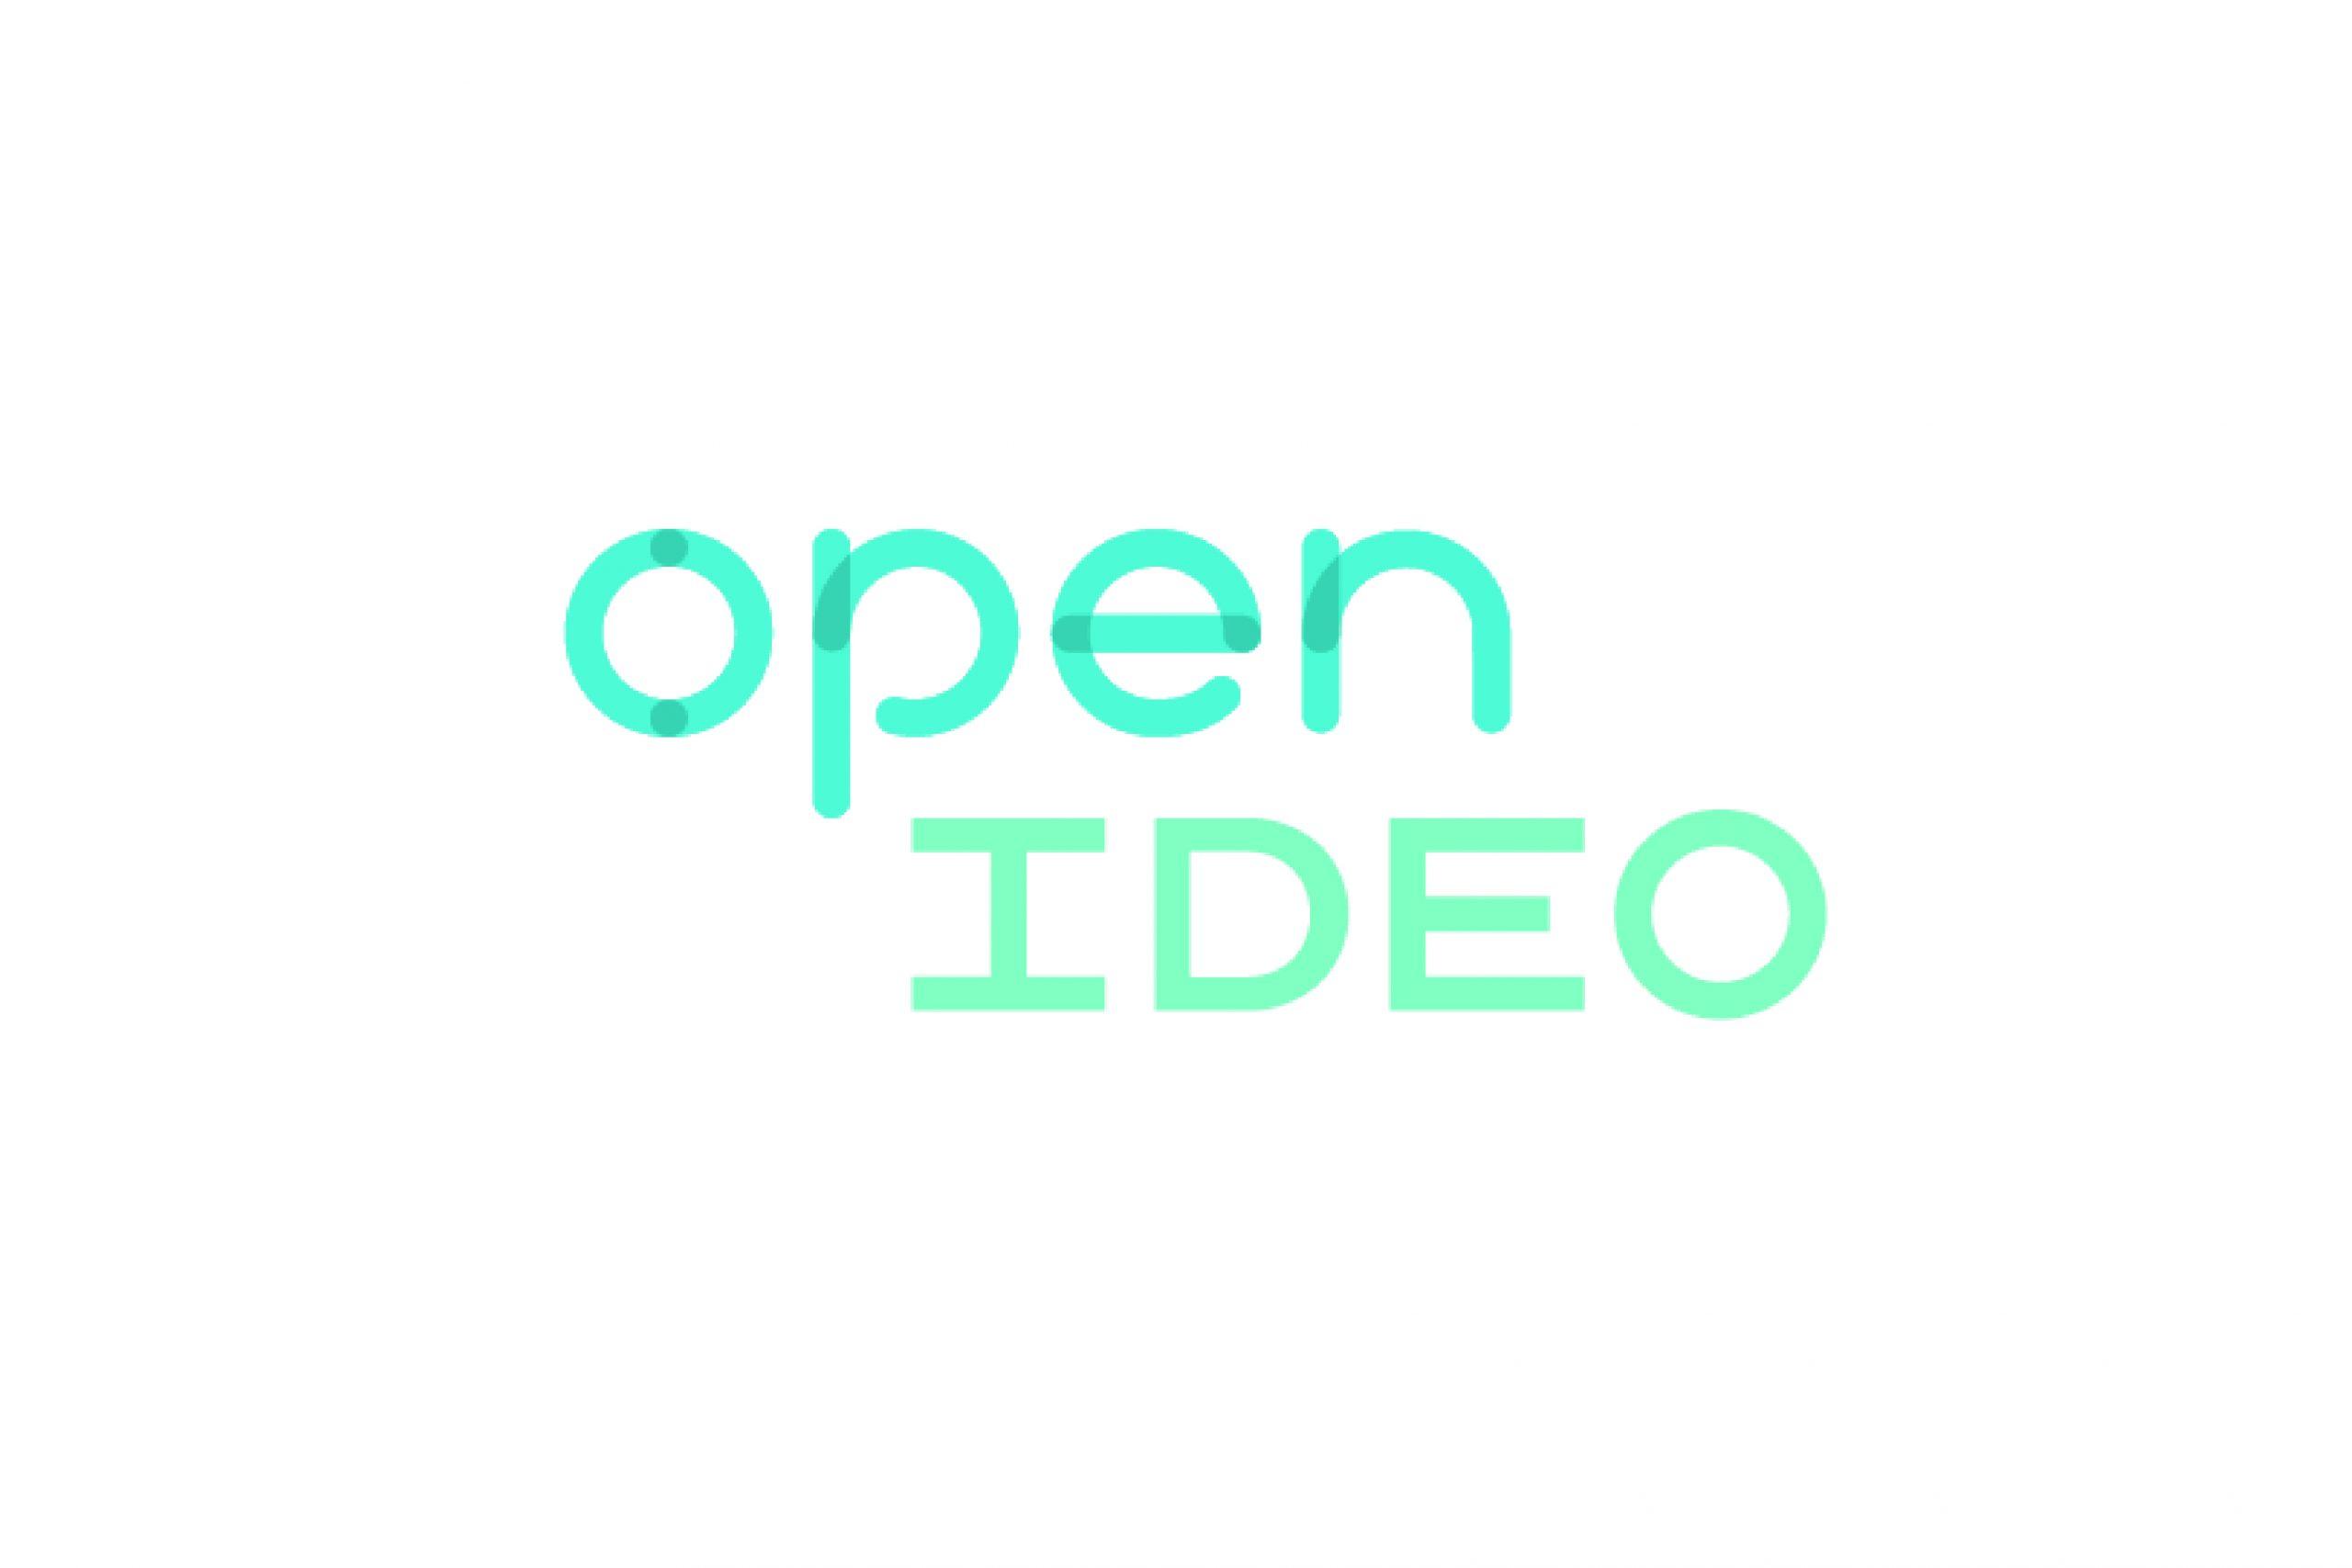 open ideo